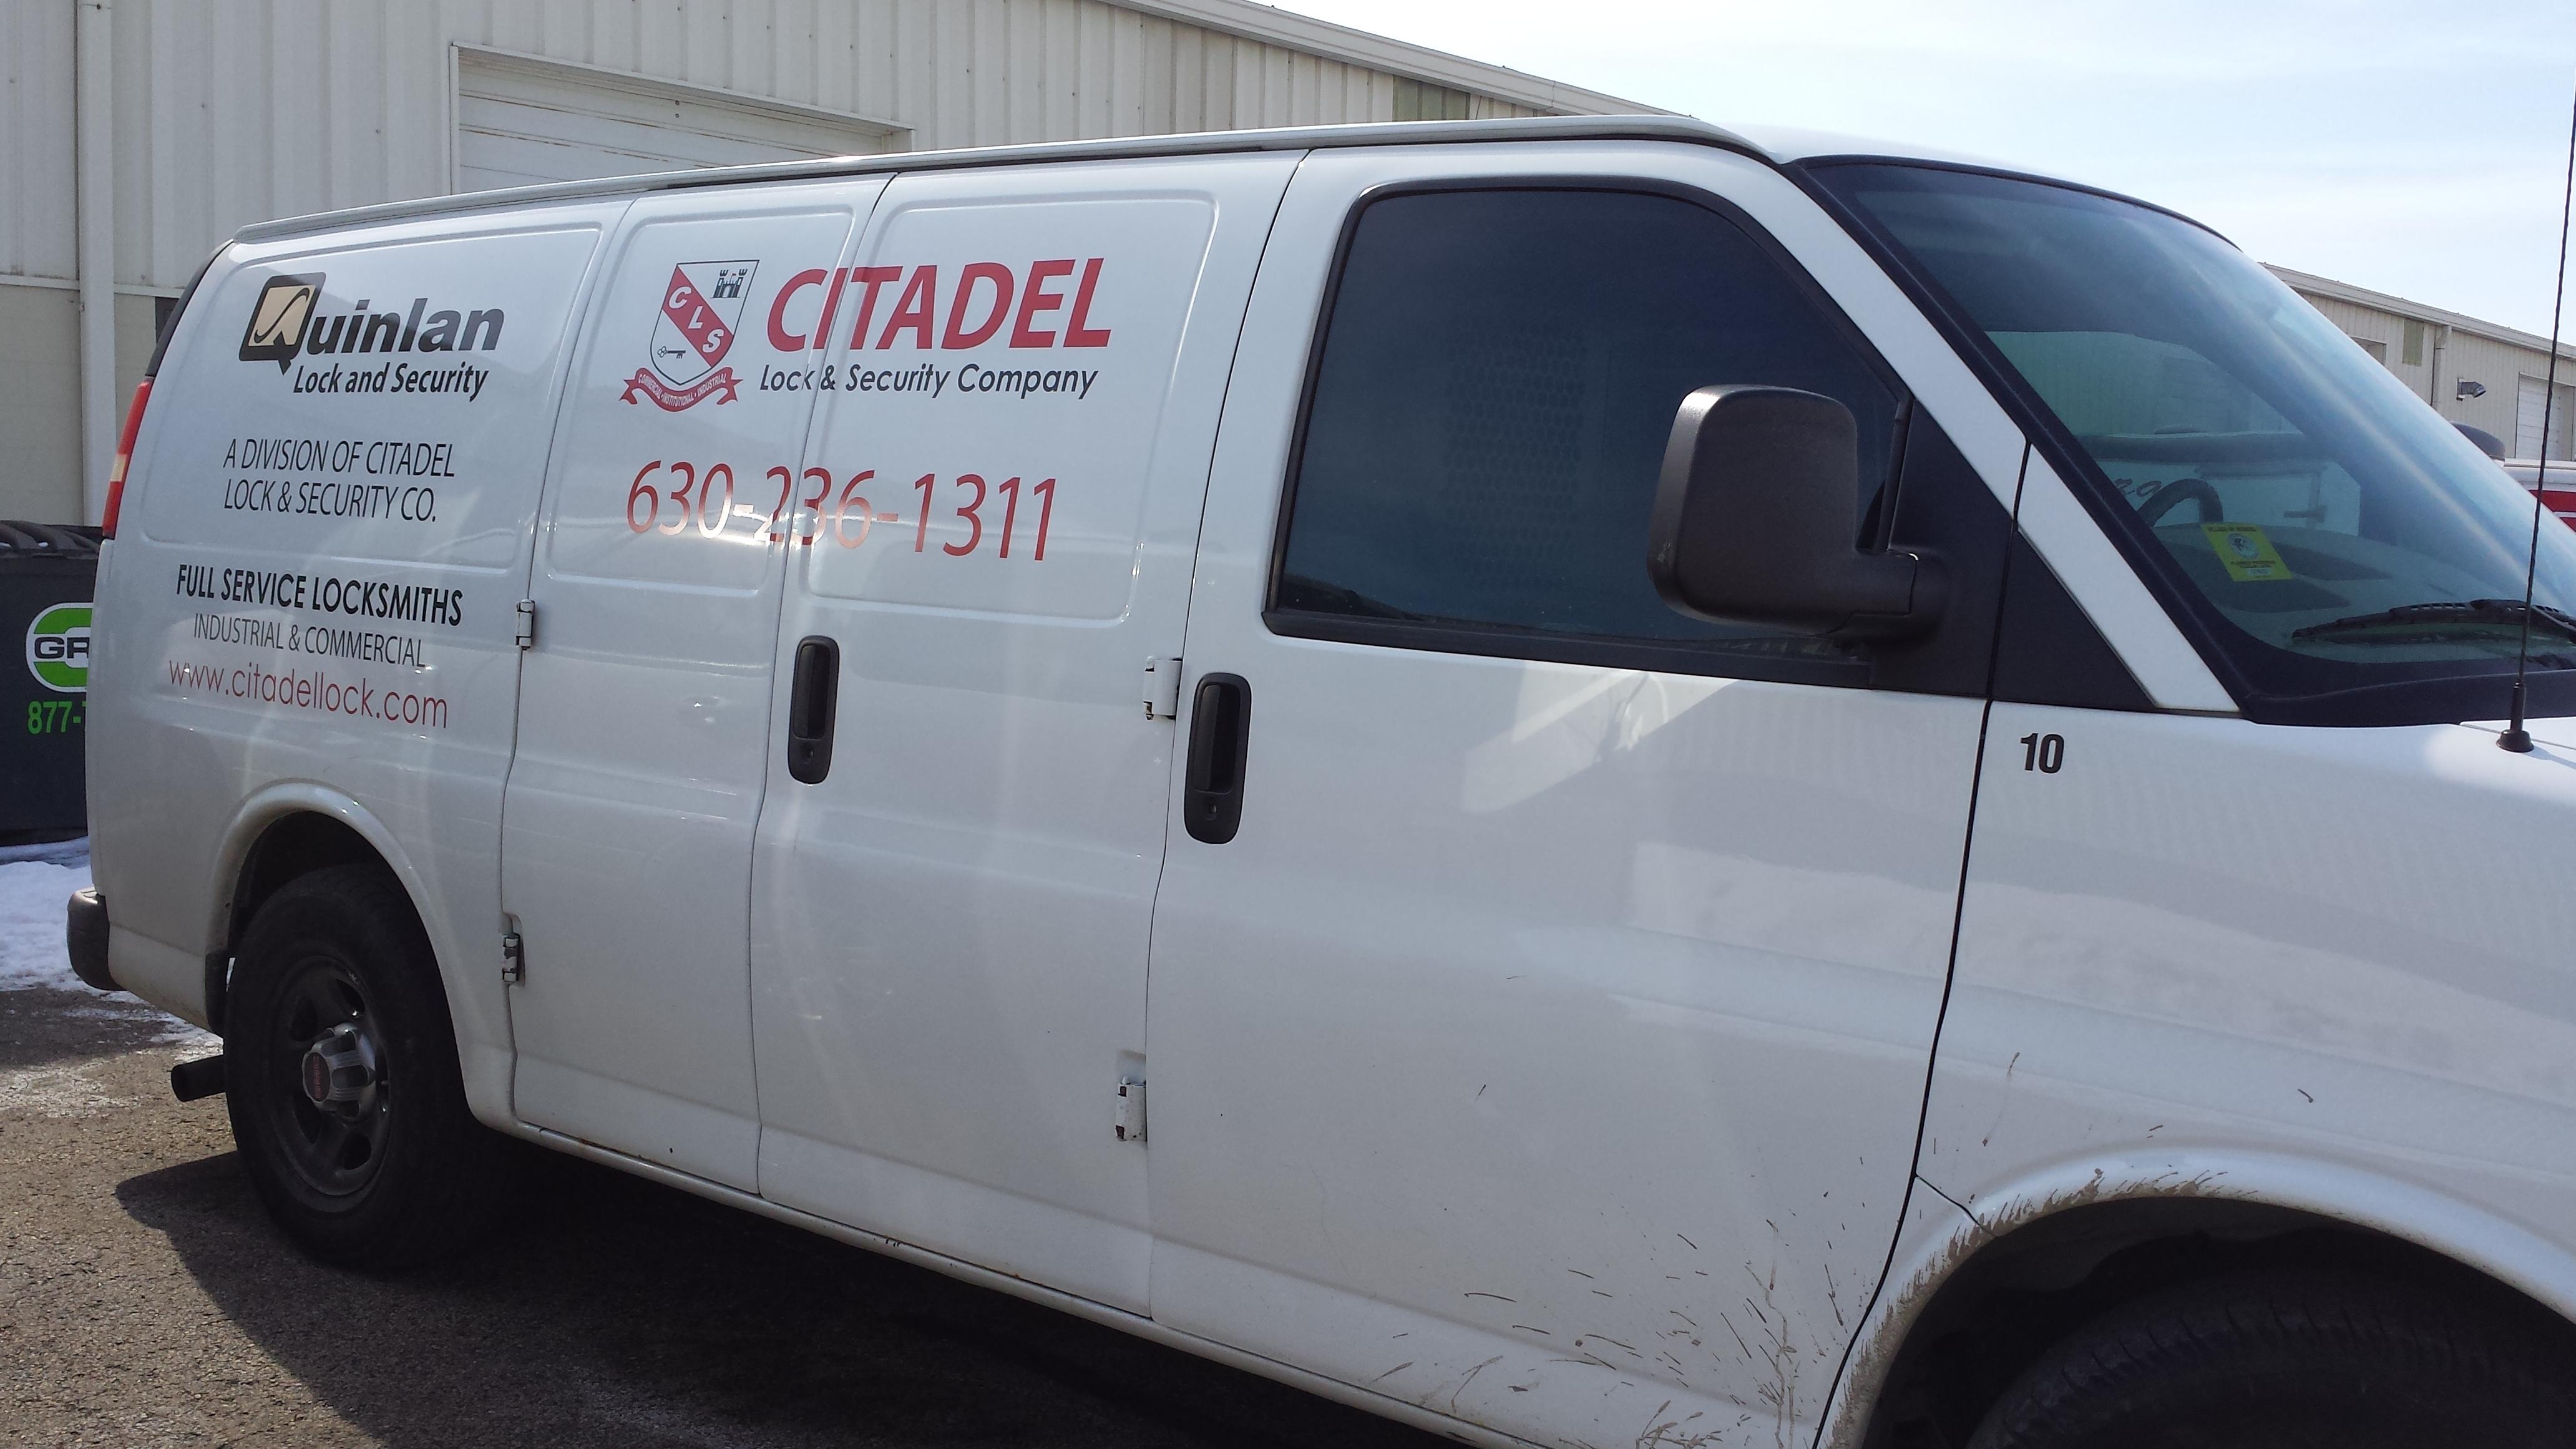 Citadel Lock & Security Company image 4